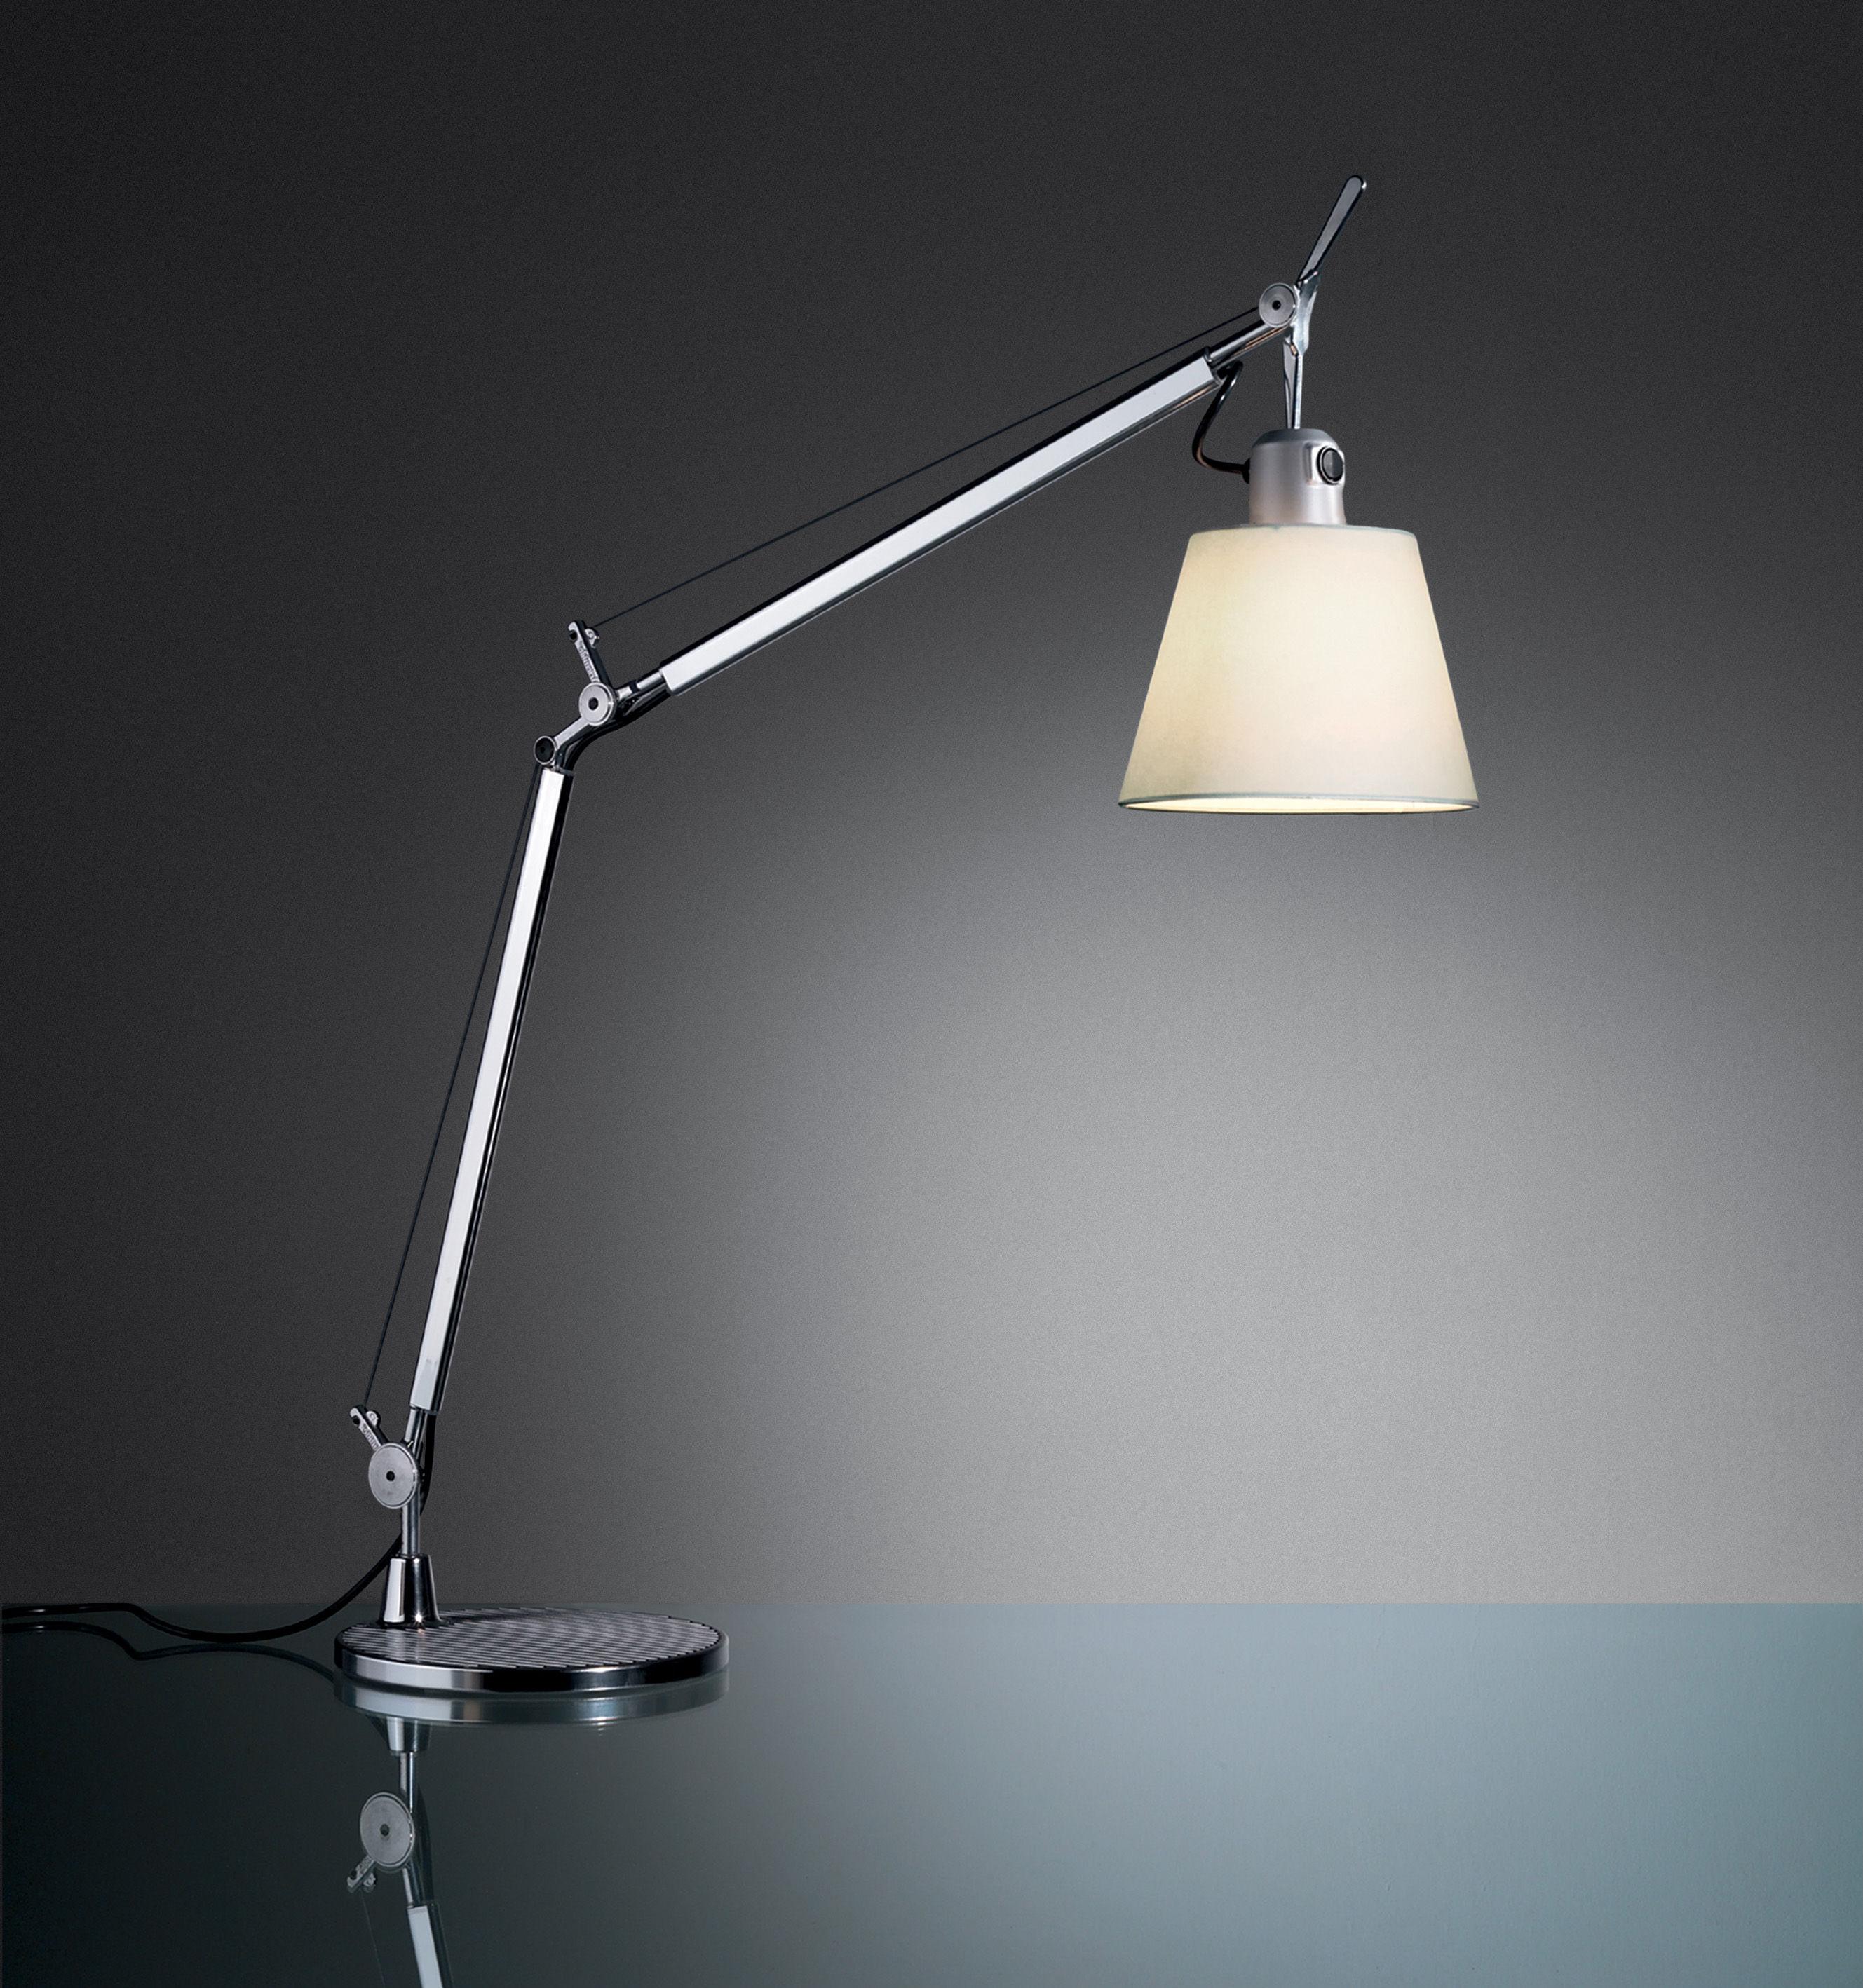 Tolomeo Basculante HALO Table lamp